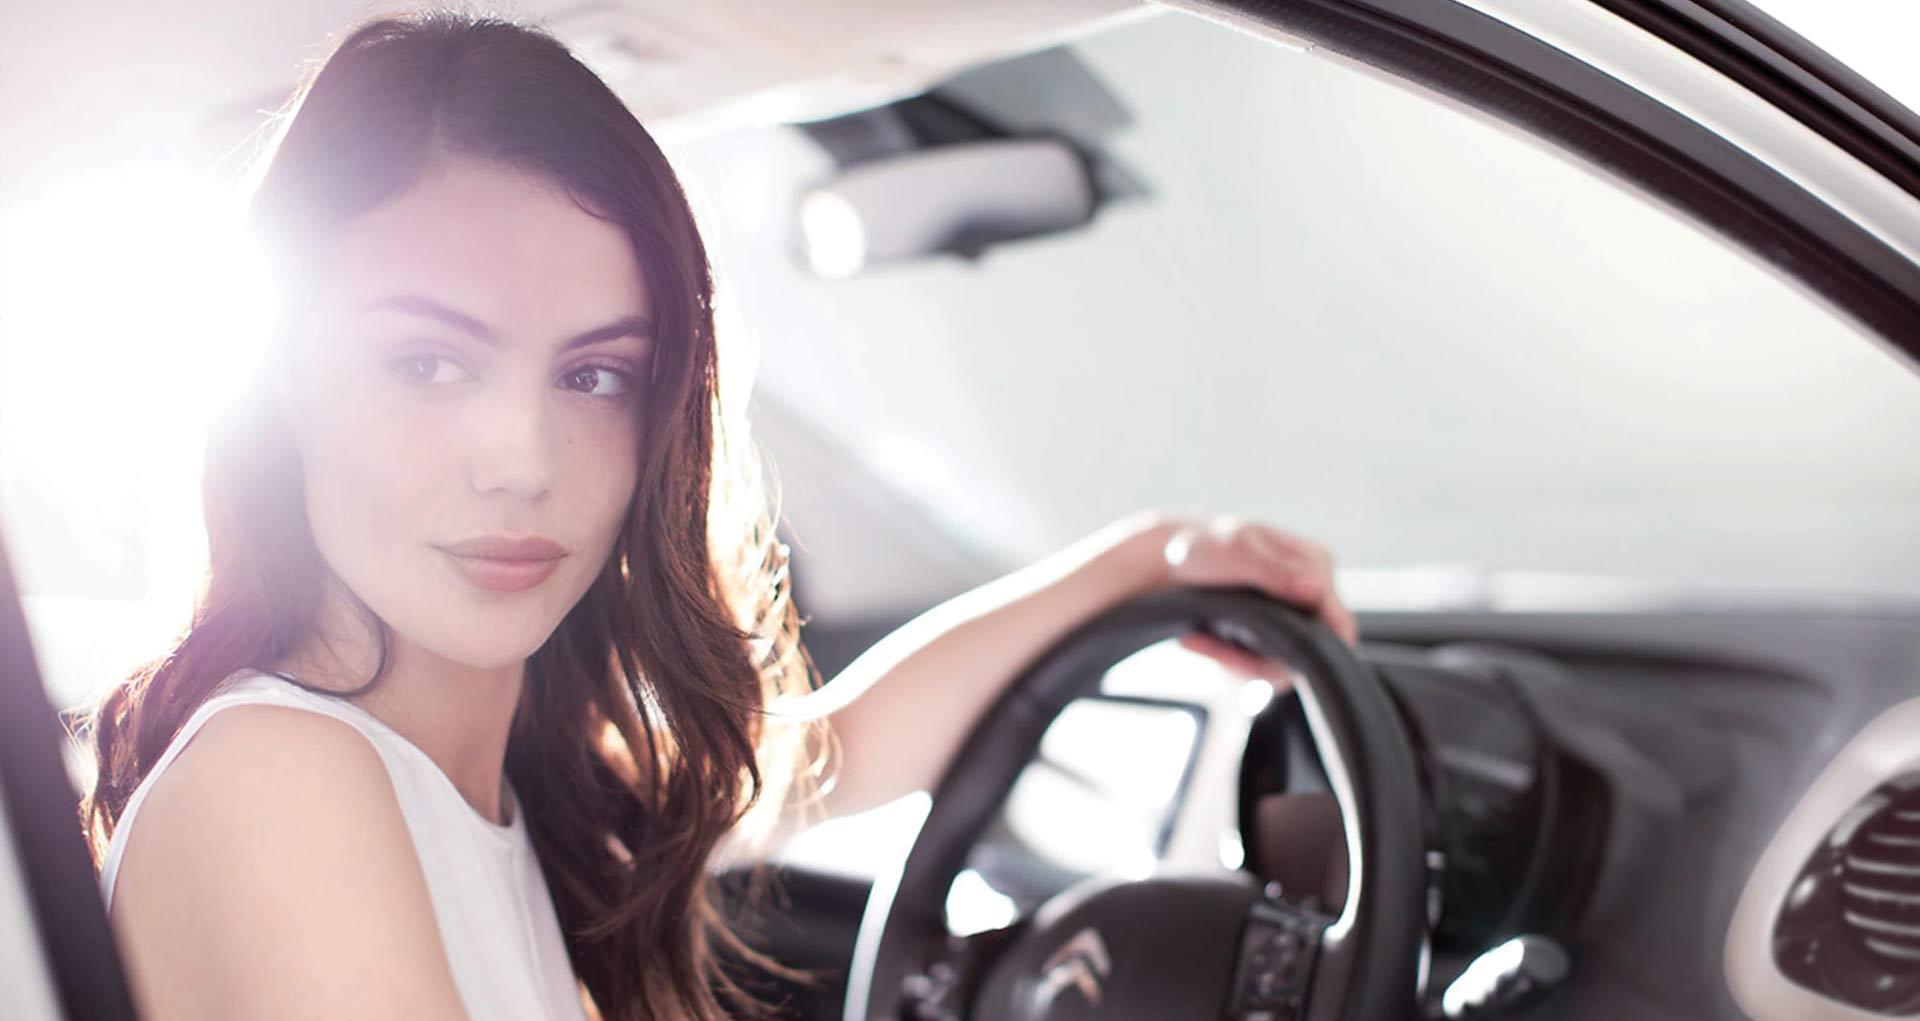 woman-driving-c1